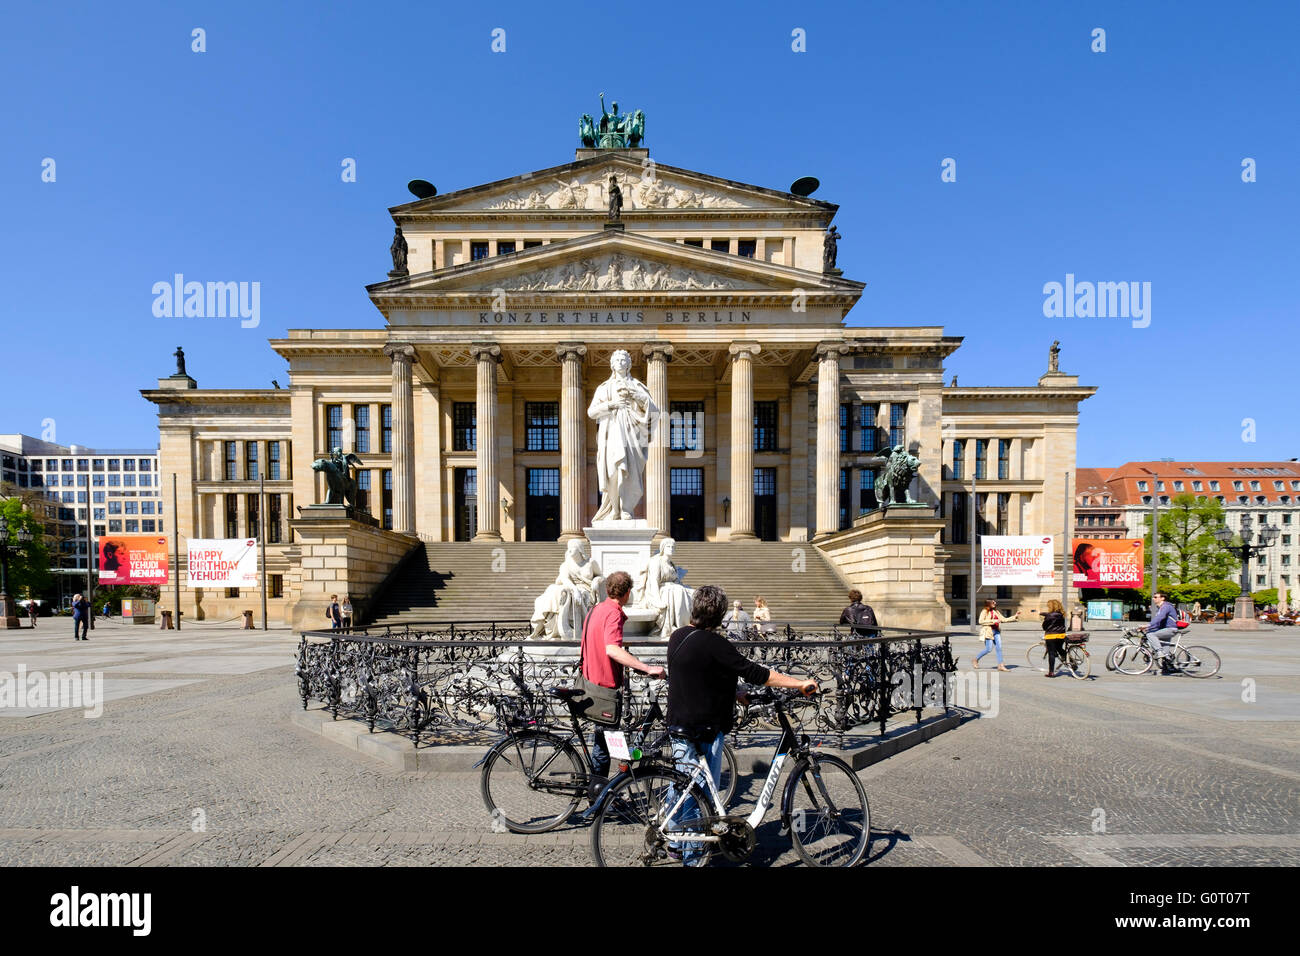 Konzerthaus et Schiller statue en place Gendarmenmarkt à Mitte Berlin Allemagne Photo Stock